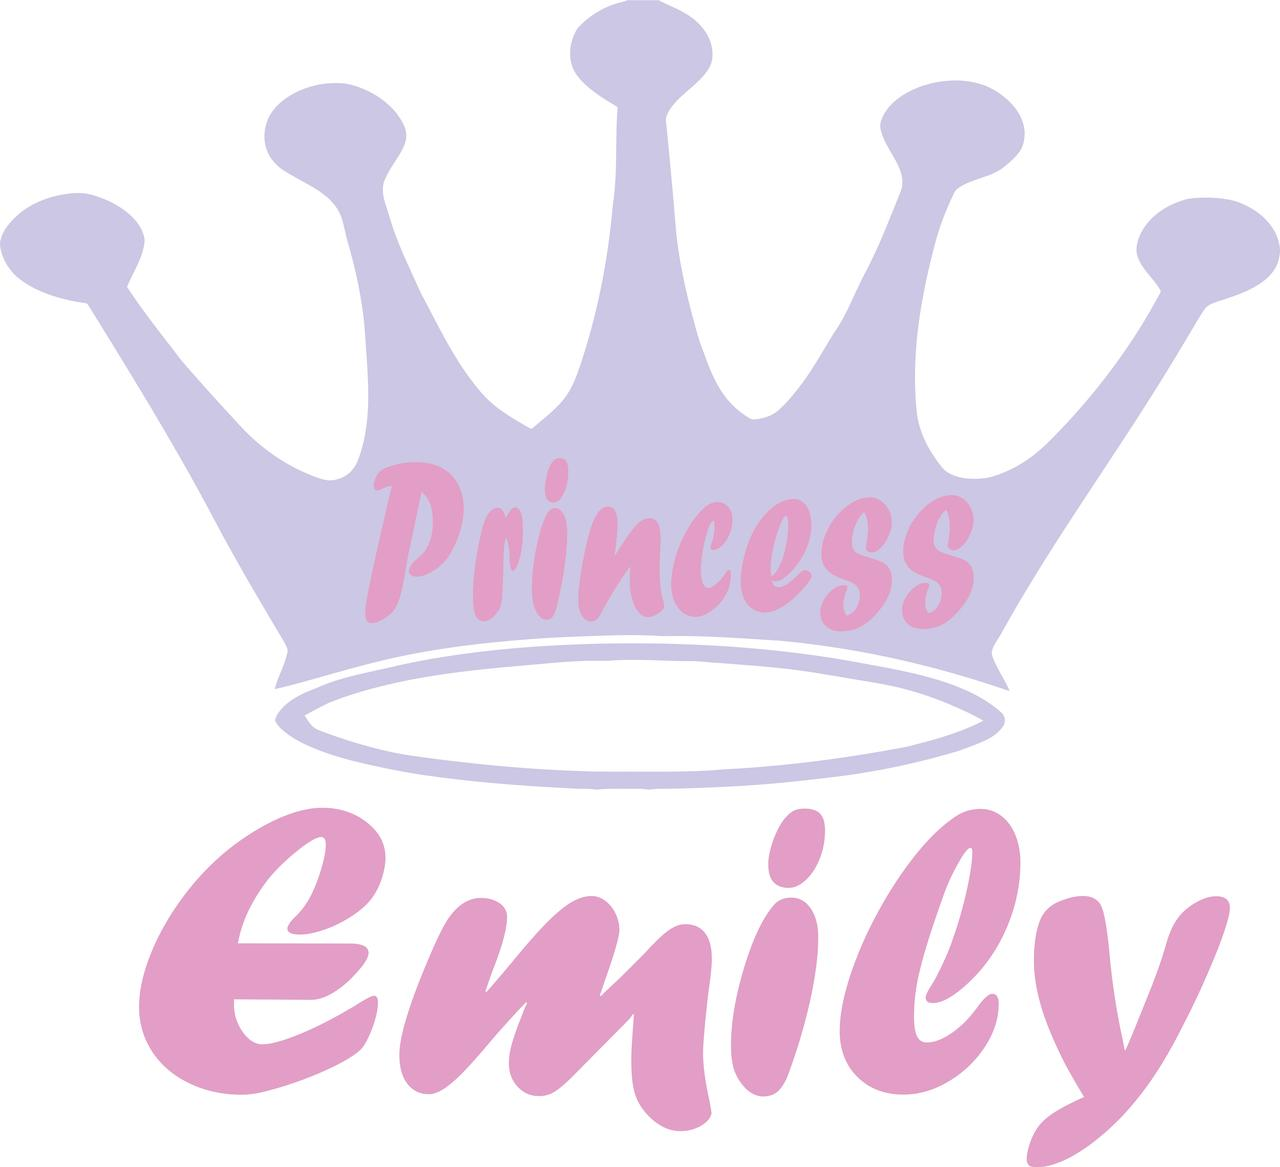 Personalised 3 Piece Girls Cutlery Set PRINCESS CROWN Motif